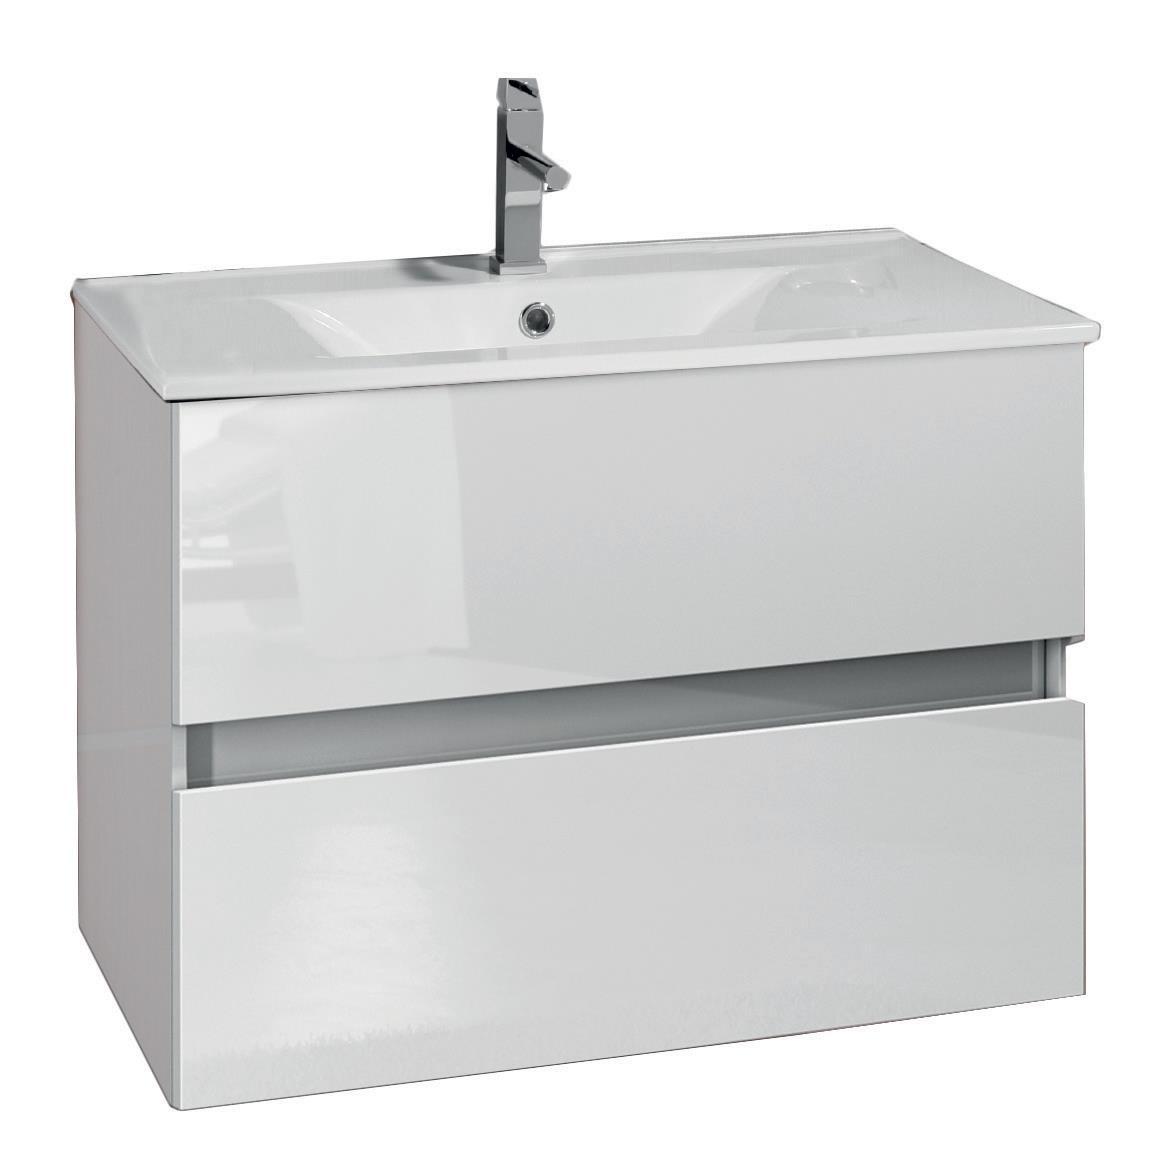 Mobile bagno sospeso moderno bianco lucido 75 cm lavabo - Bagno bianco lucido ...